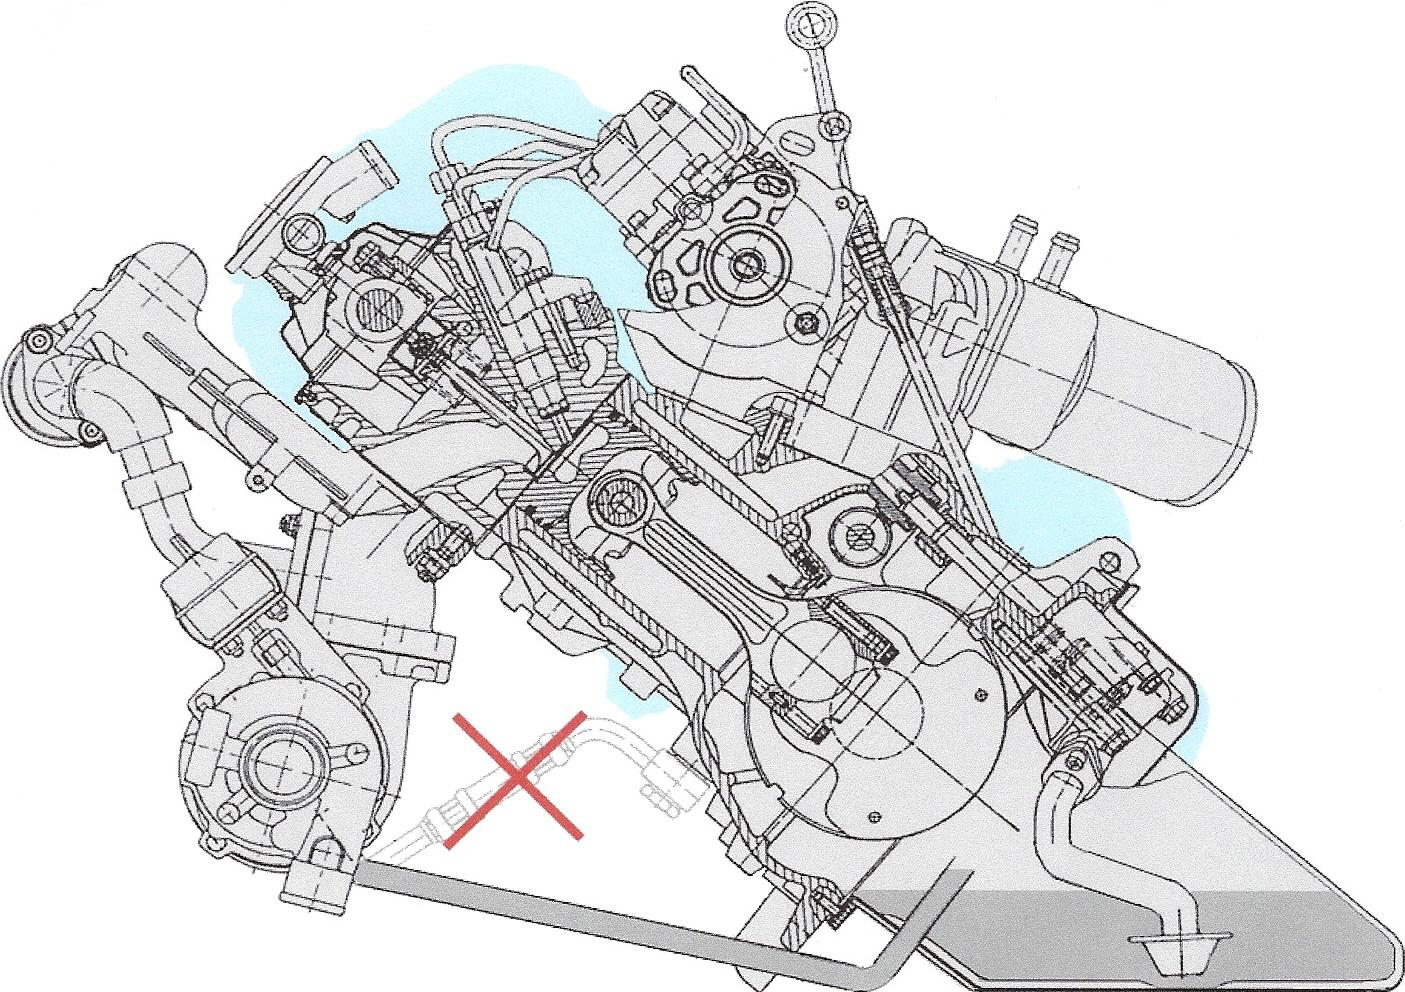 TDI engine on 50 degrees